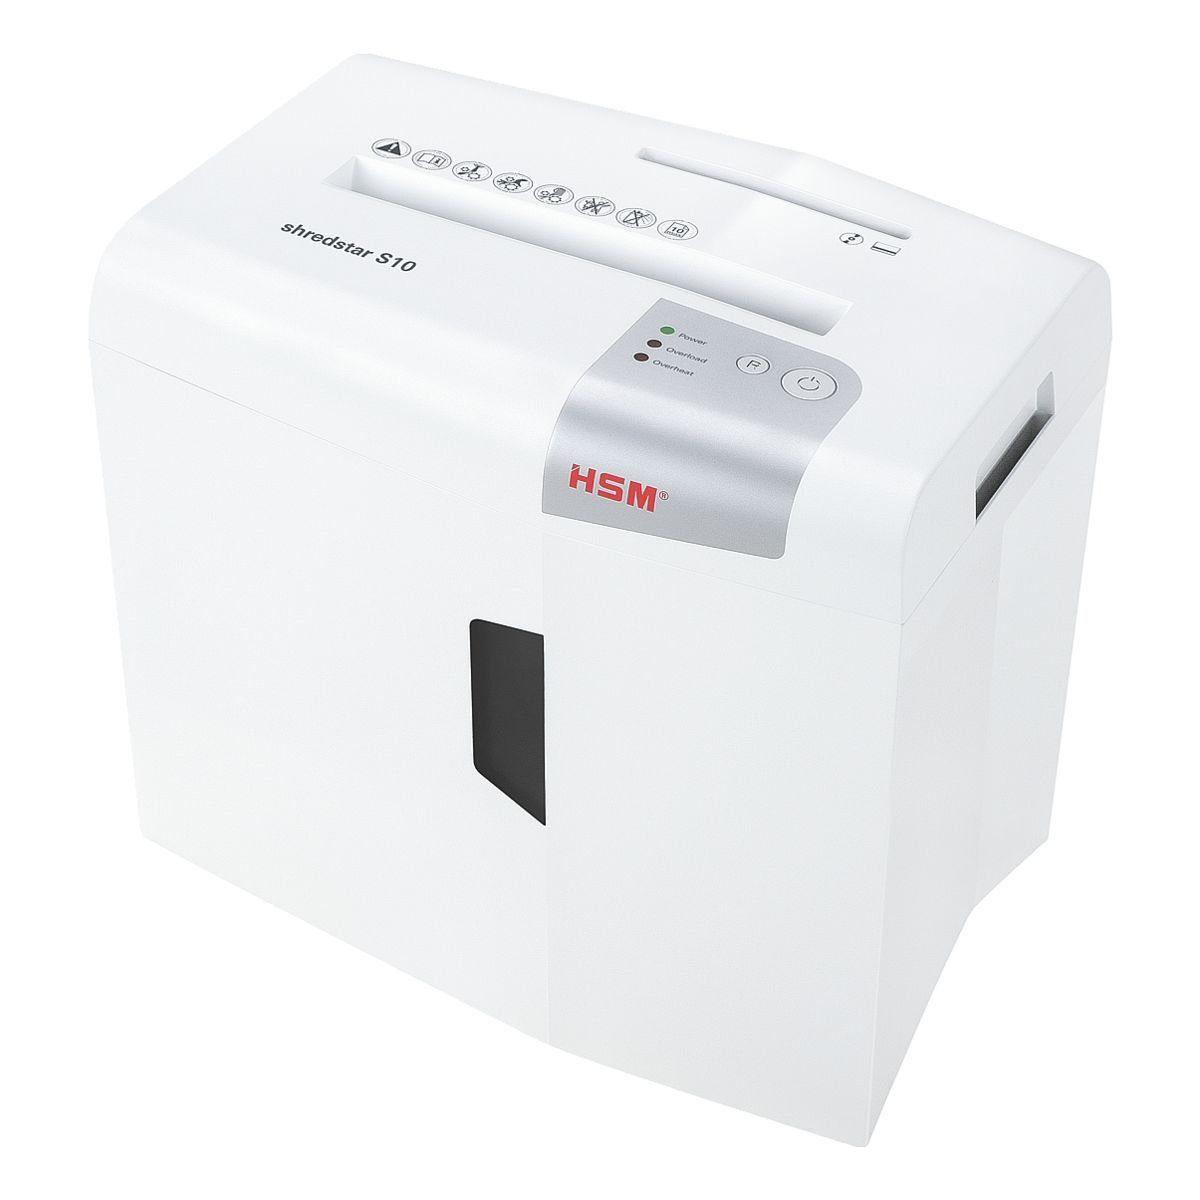 HSM Aktenvernichter »shredstar S10 6 mm«